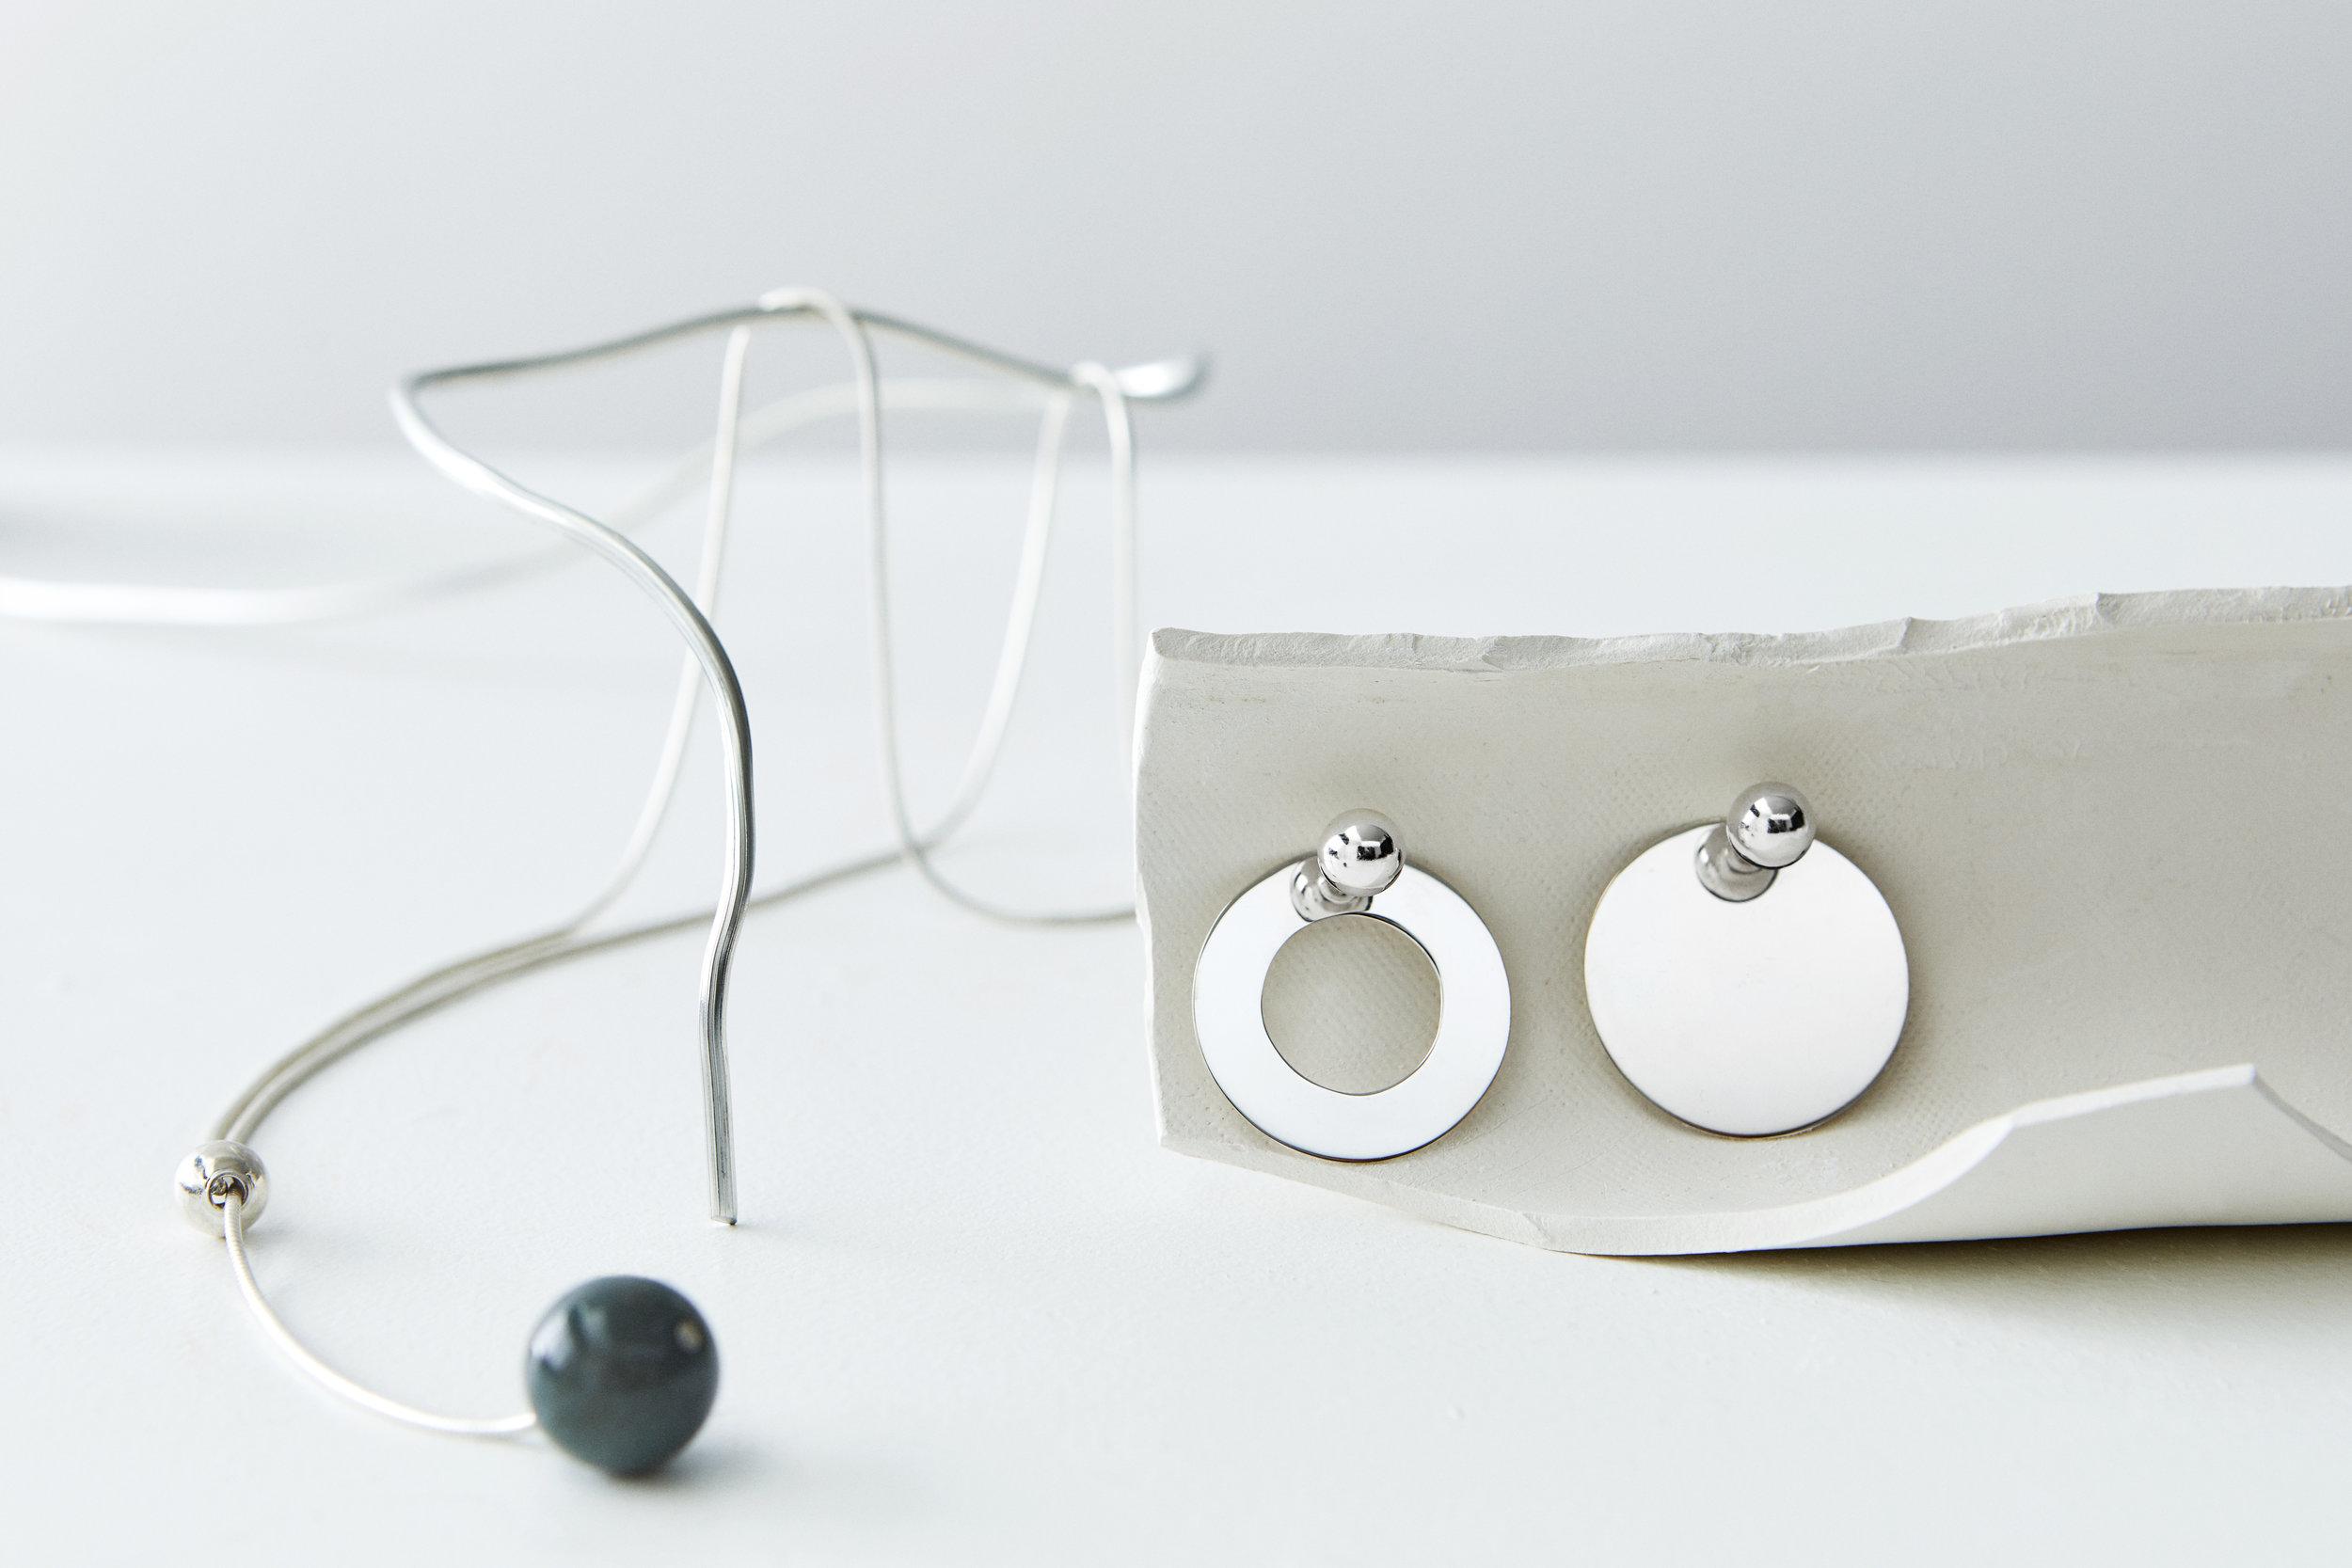 ▲ ARPEGGIO necklace, RESONANCE & CONSONANCE earrings